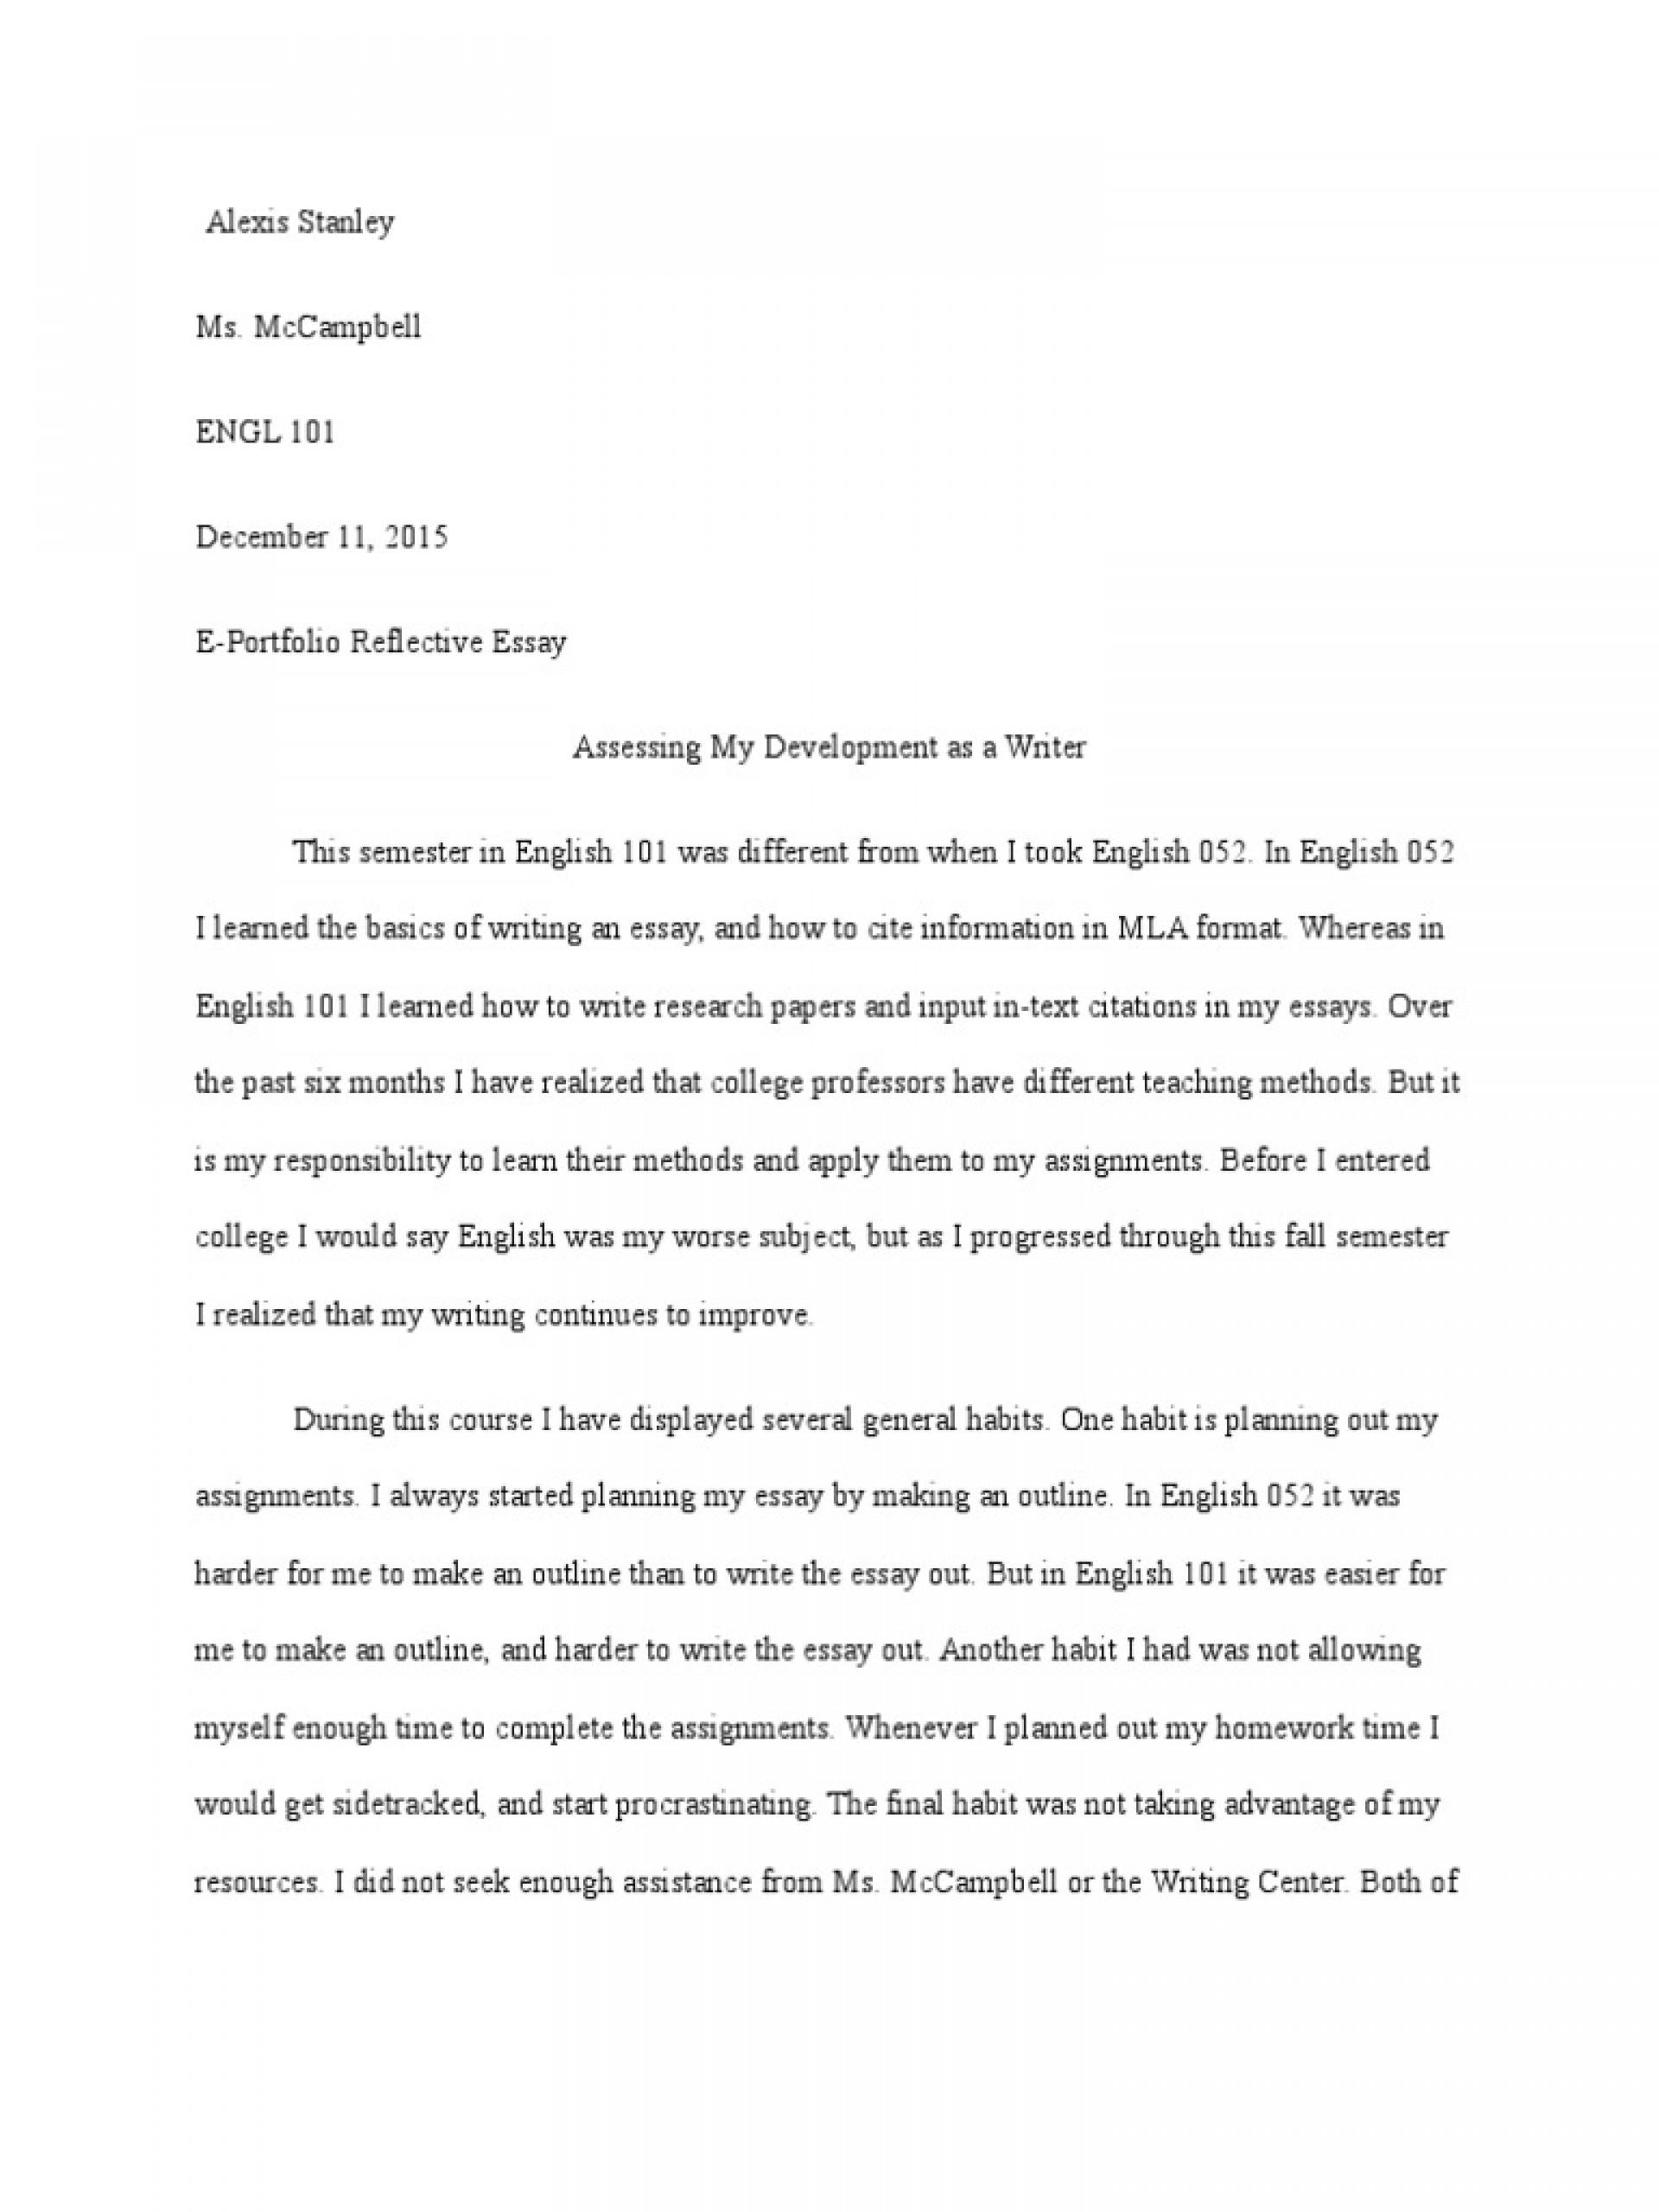 002 Essay Example Reflective English Marvelous 101 1920